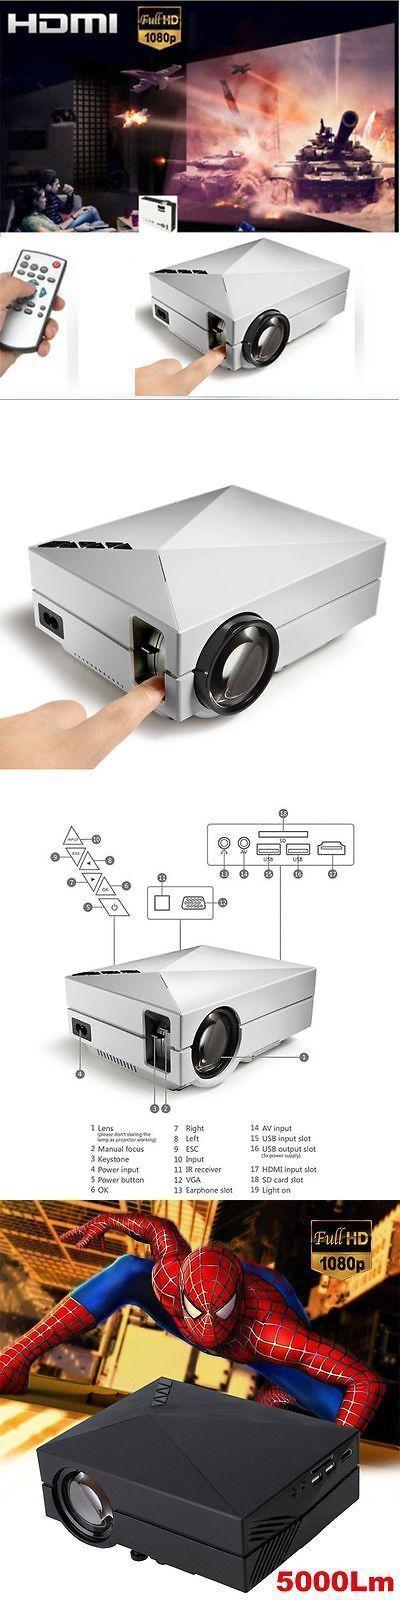 Home Theater Projectors: 1000 Lumens Hd Led Video Projector Home Cinema 3D Effect 1080P-Hdmi Multimedia BUY IT NOW ONLY: $71.99 #hometheatreprojectors #hometheatertips #hometheaterprojector